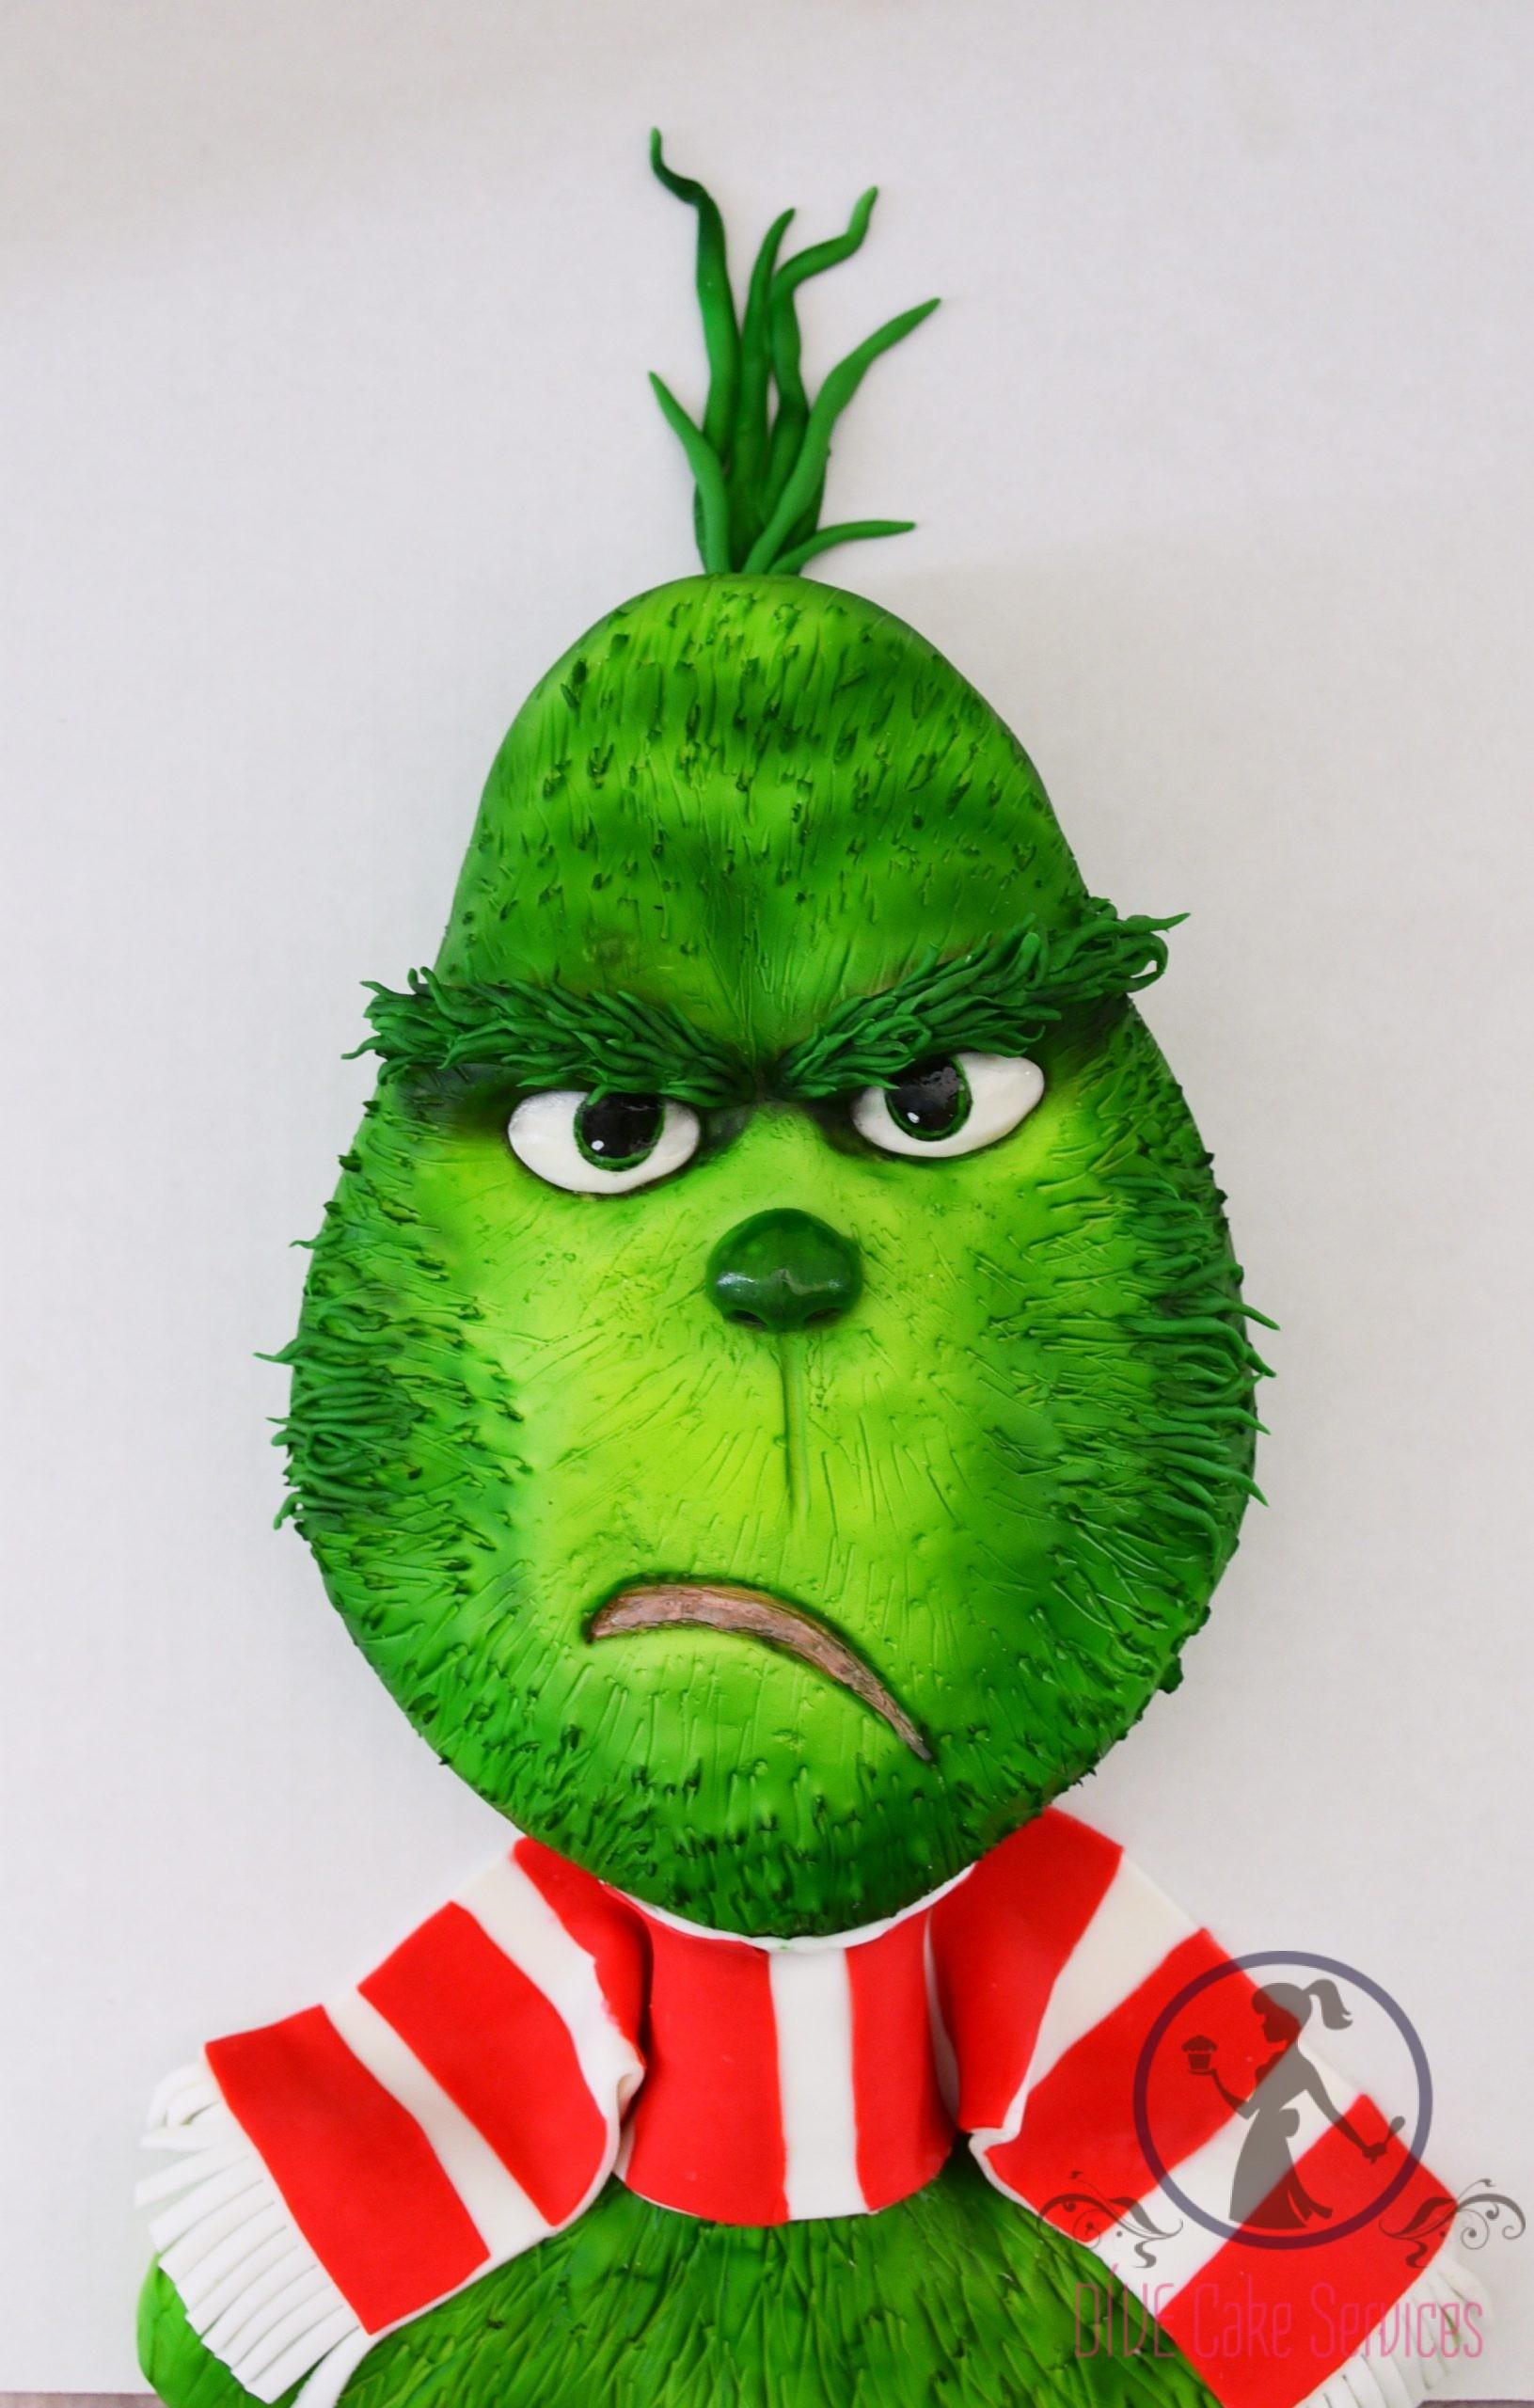 Mr. Grinch